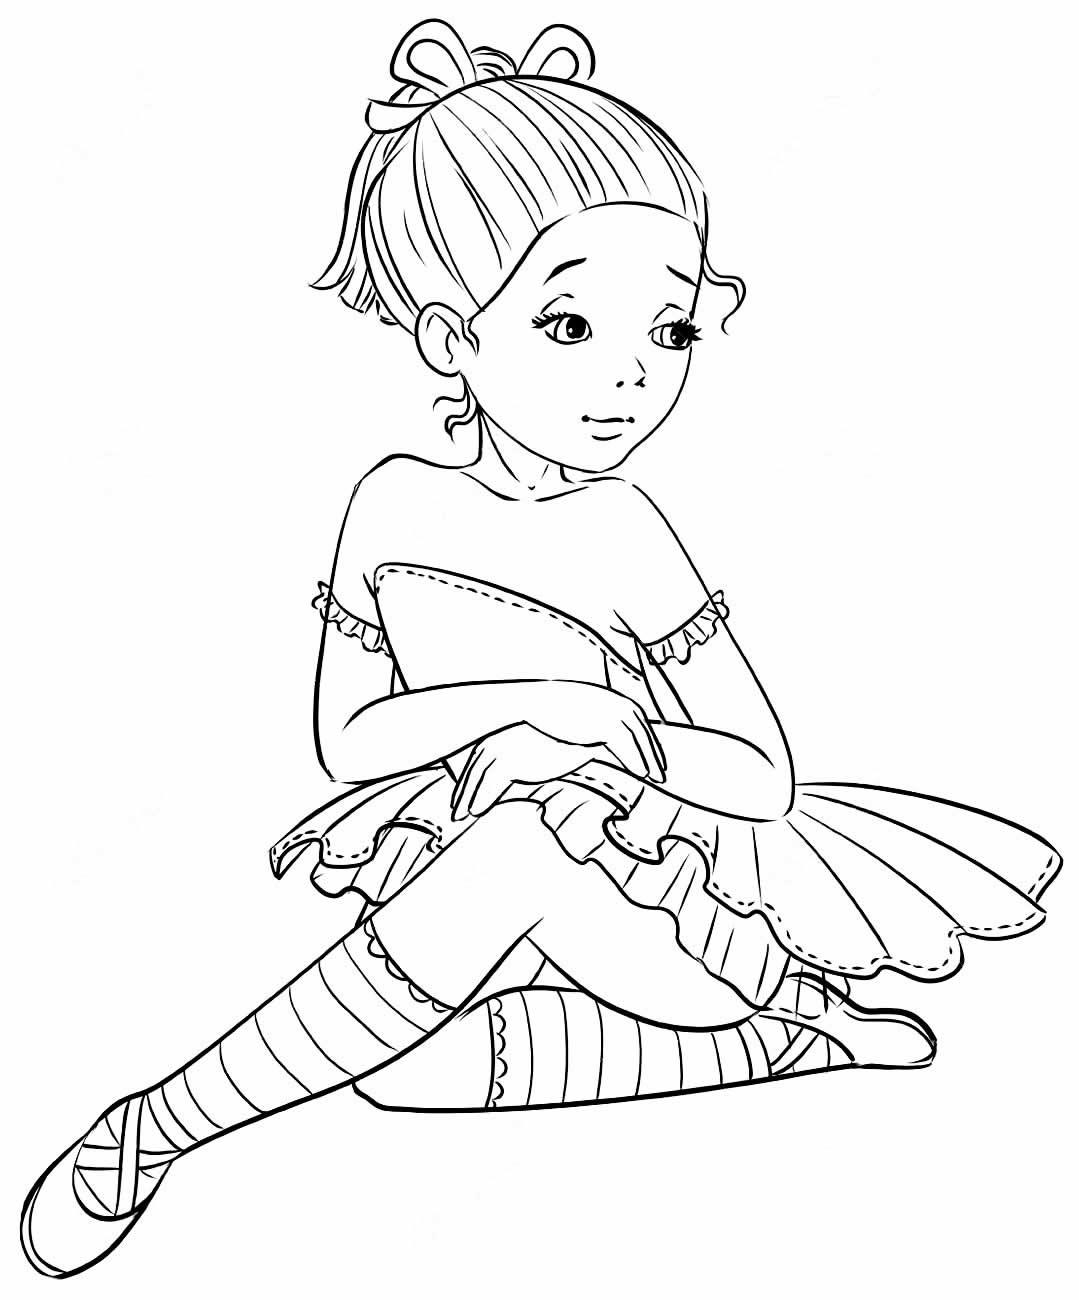 Desenho Bailarina pintar